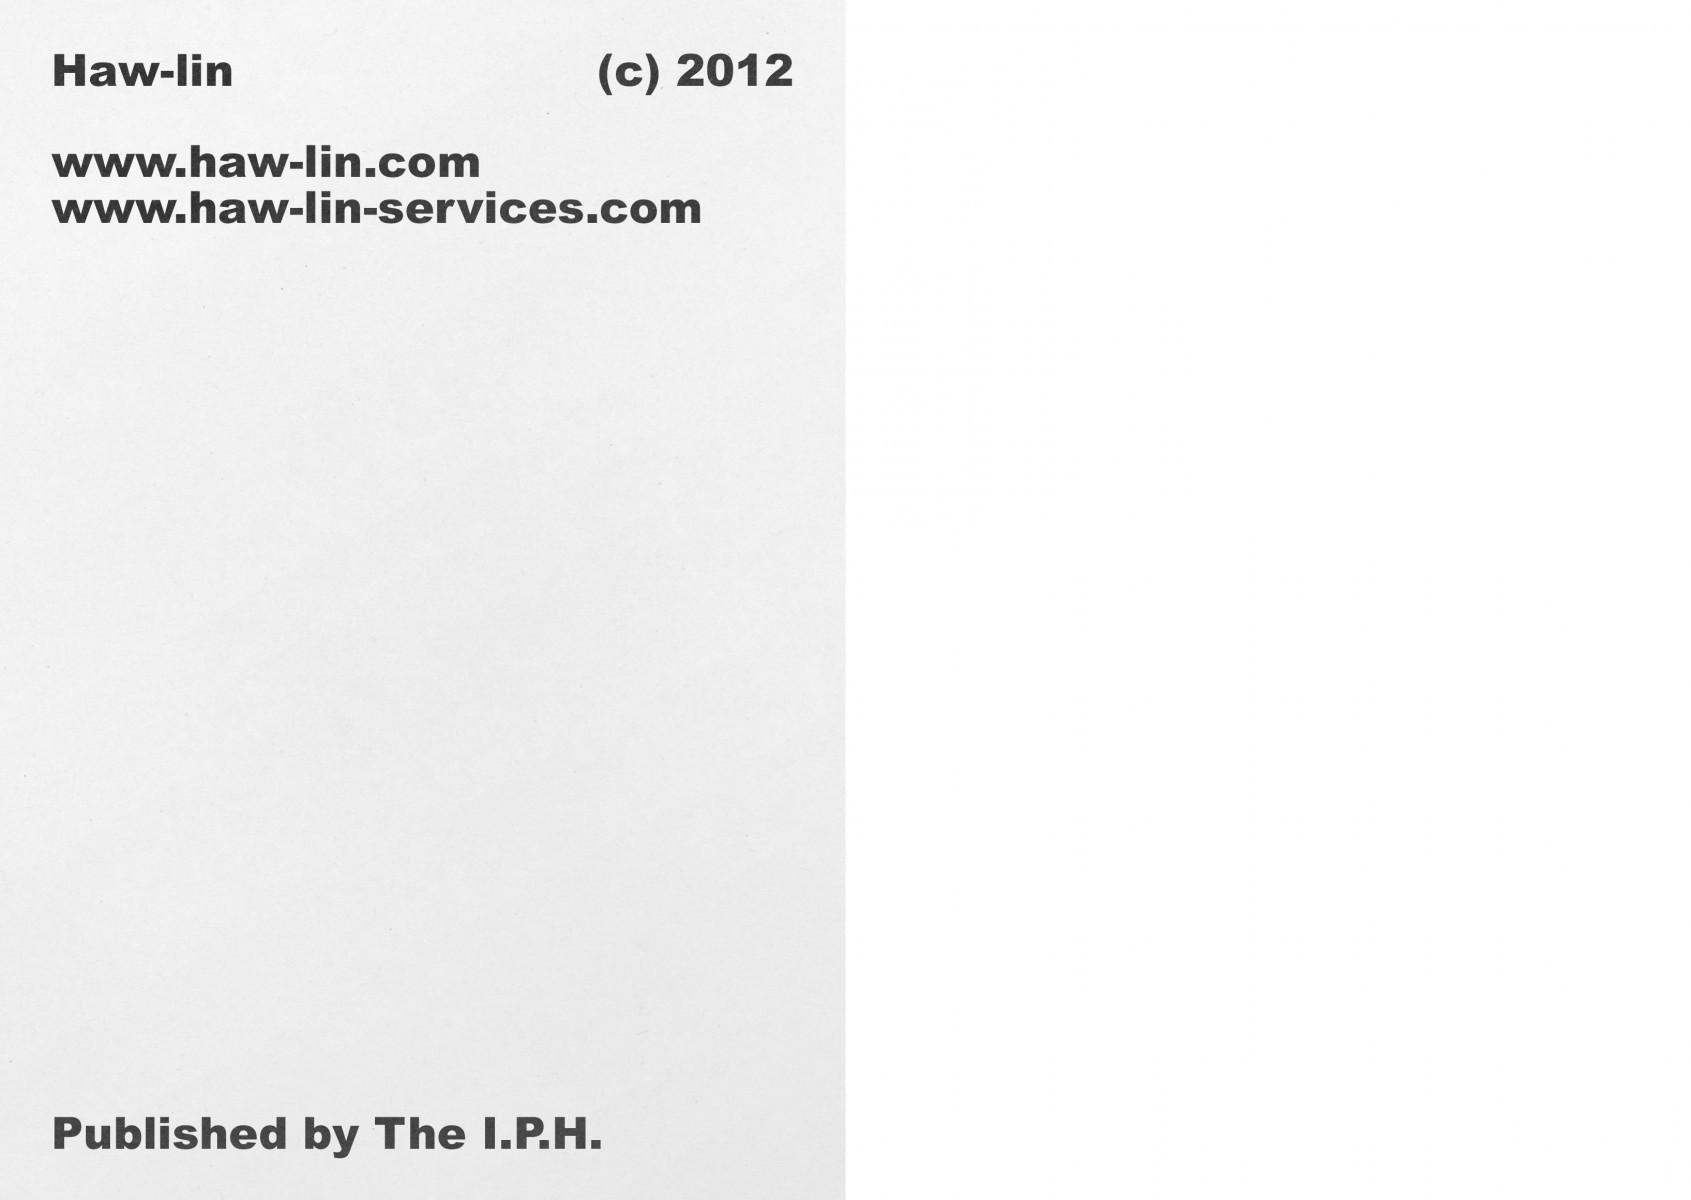 haw-lin-services.com/project/i-p-h-exhibition-catalogue/